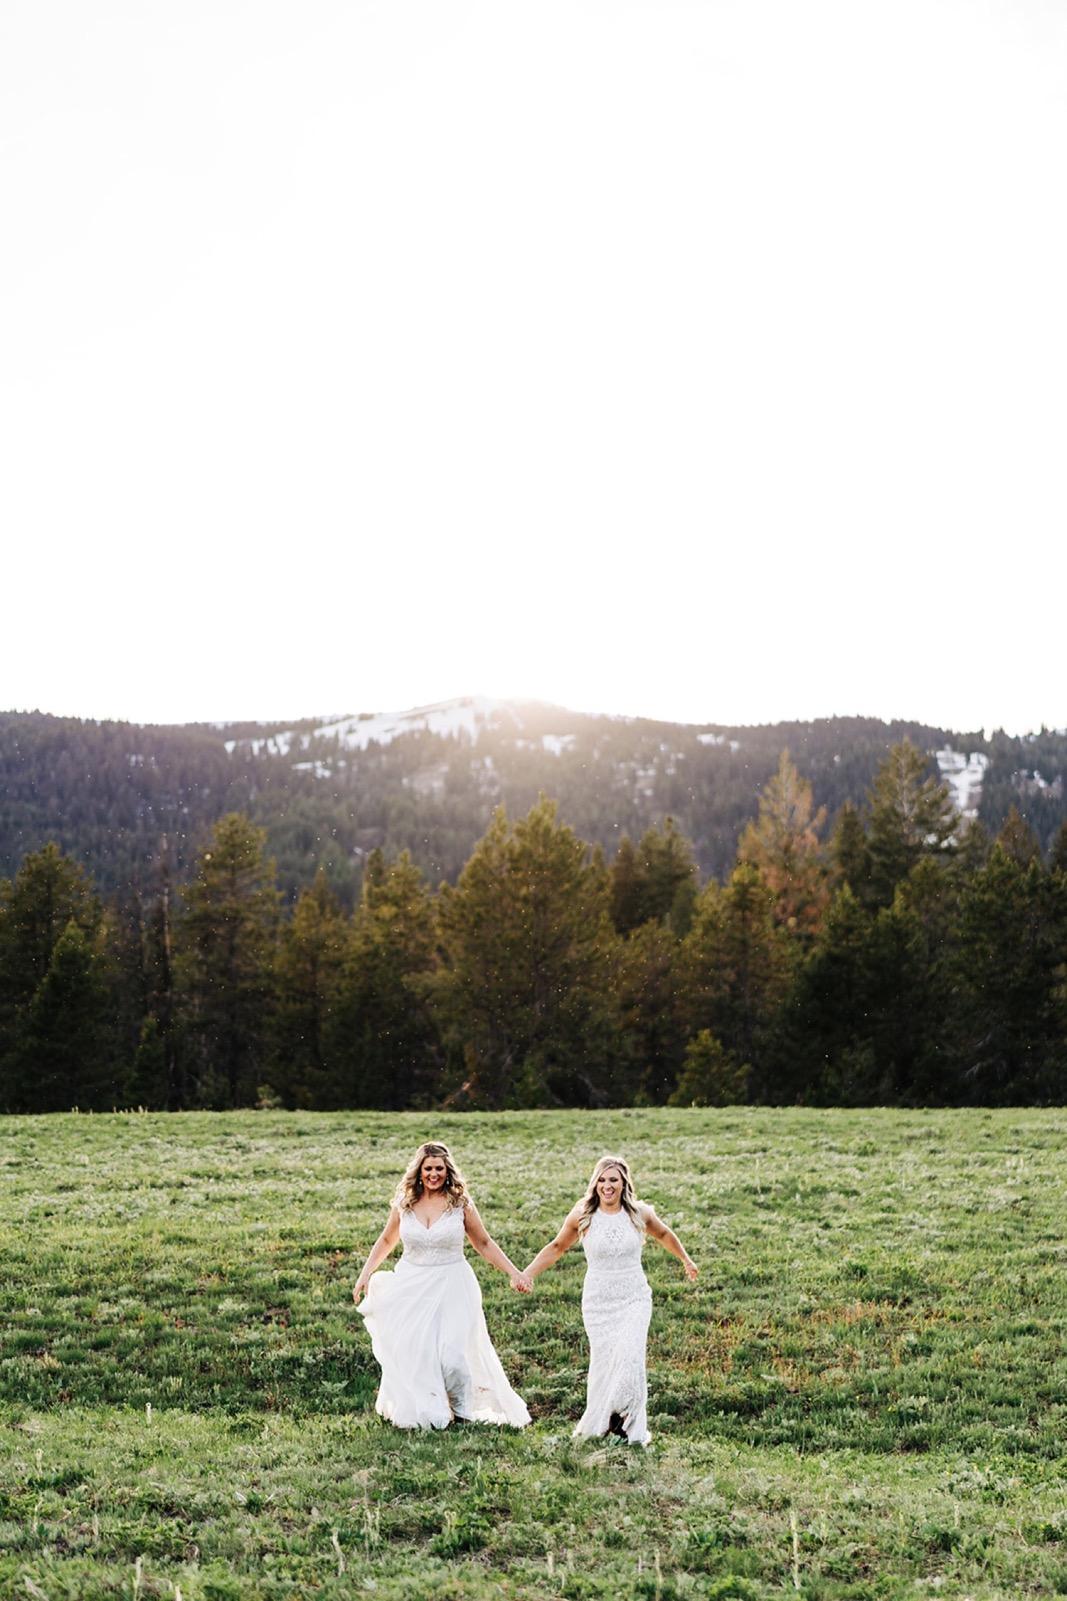 179_falissa_heather_wedding-507.jpg